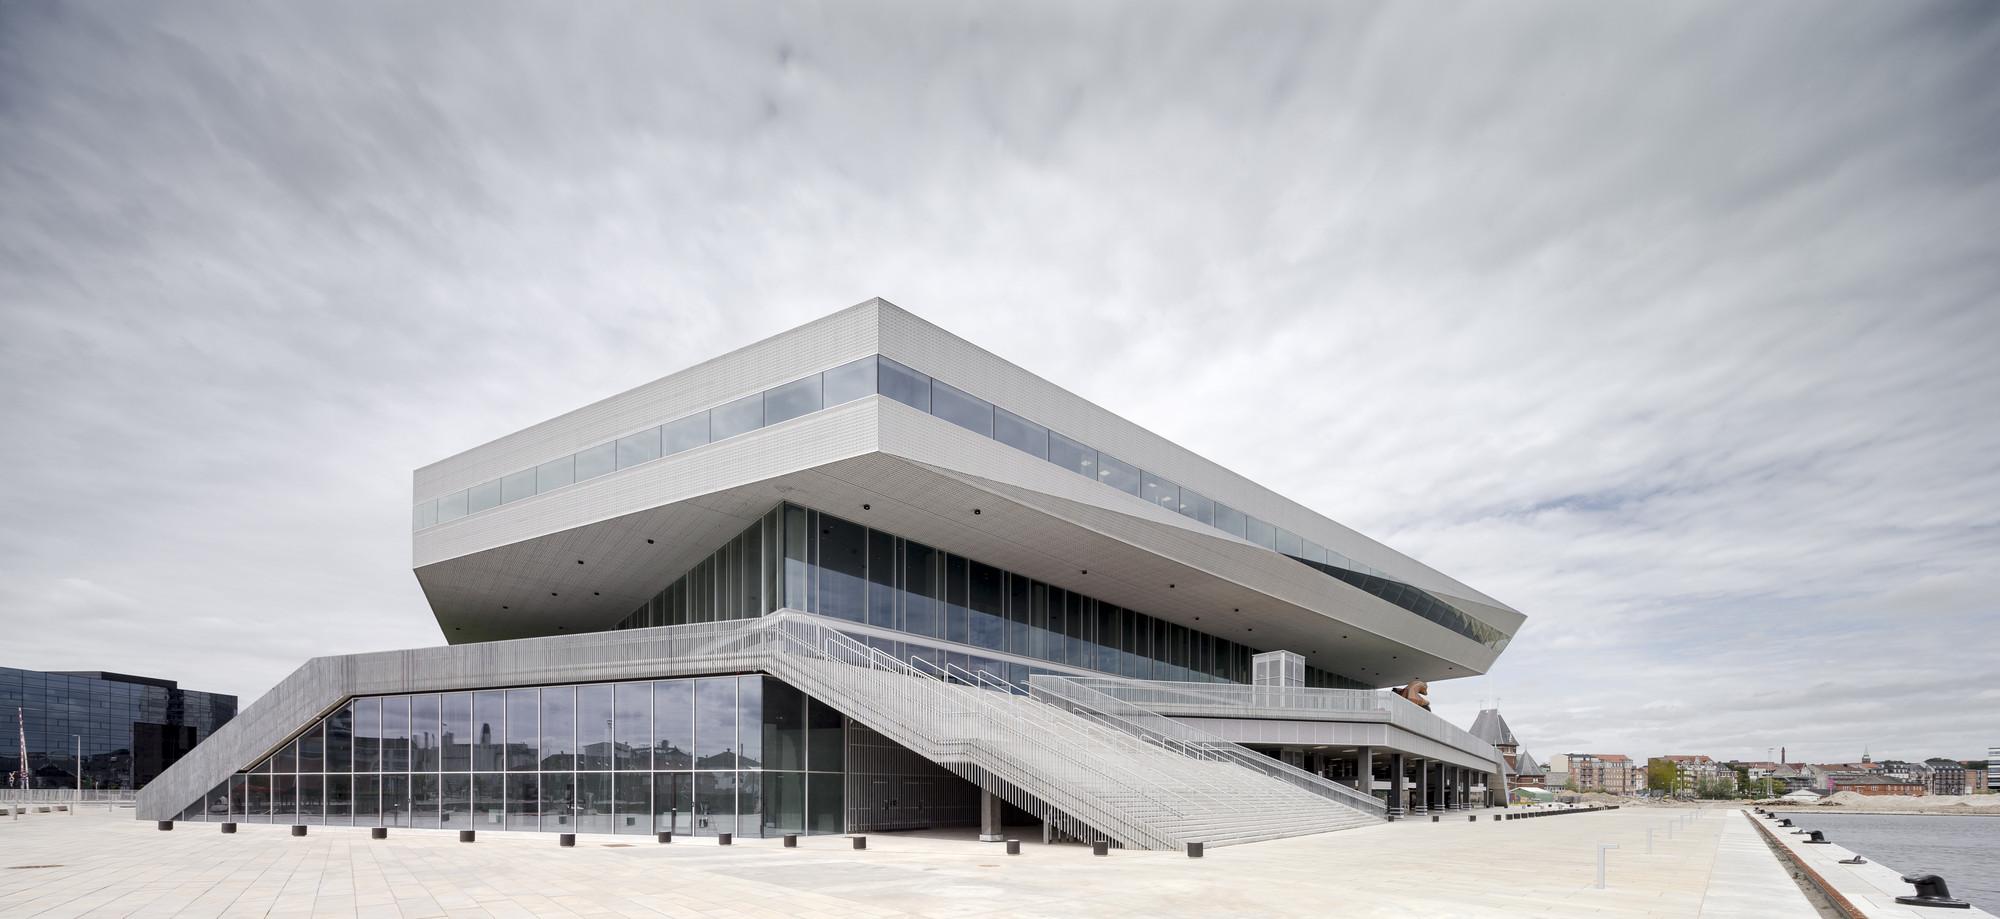 Dokk1 / schmidt hammer lassen architects, © Adam Mørk